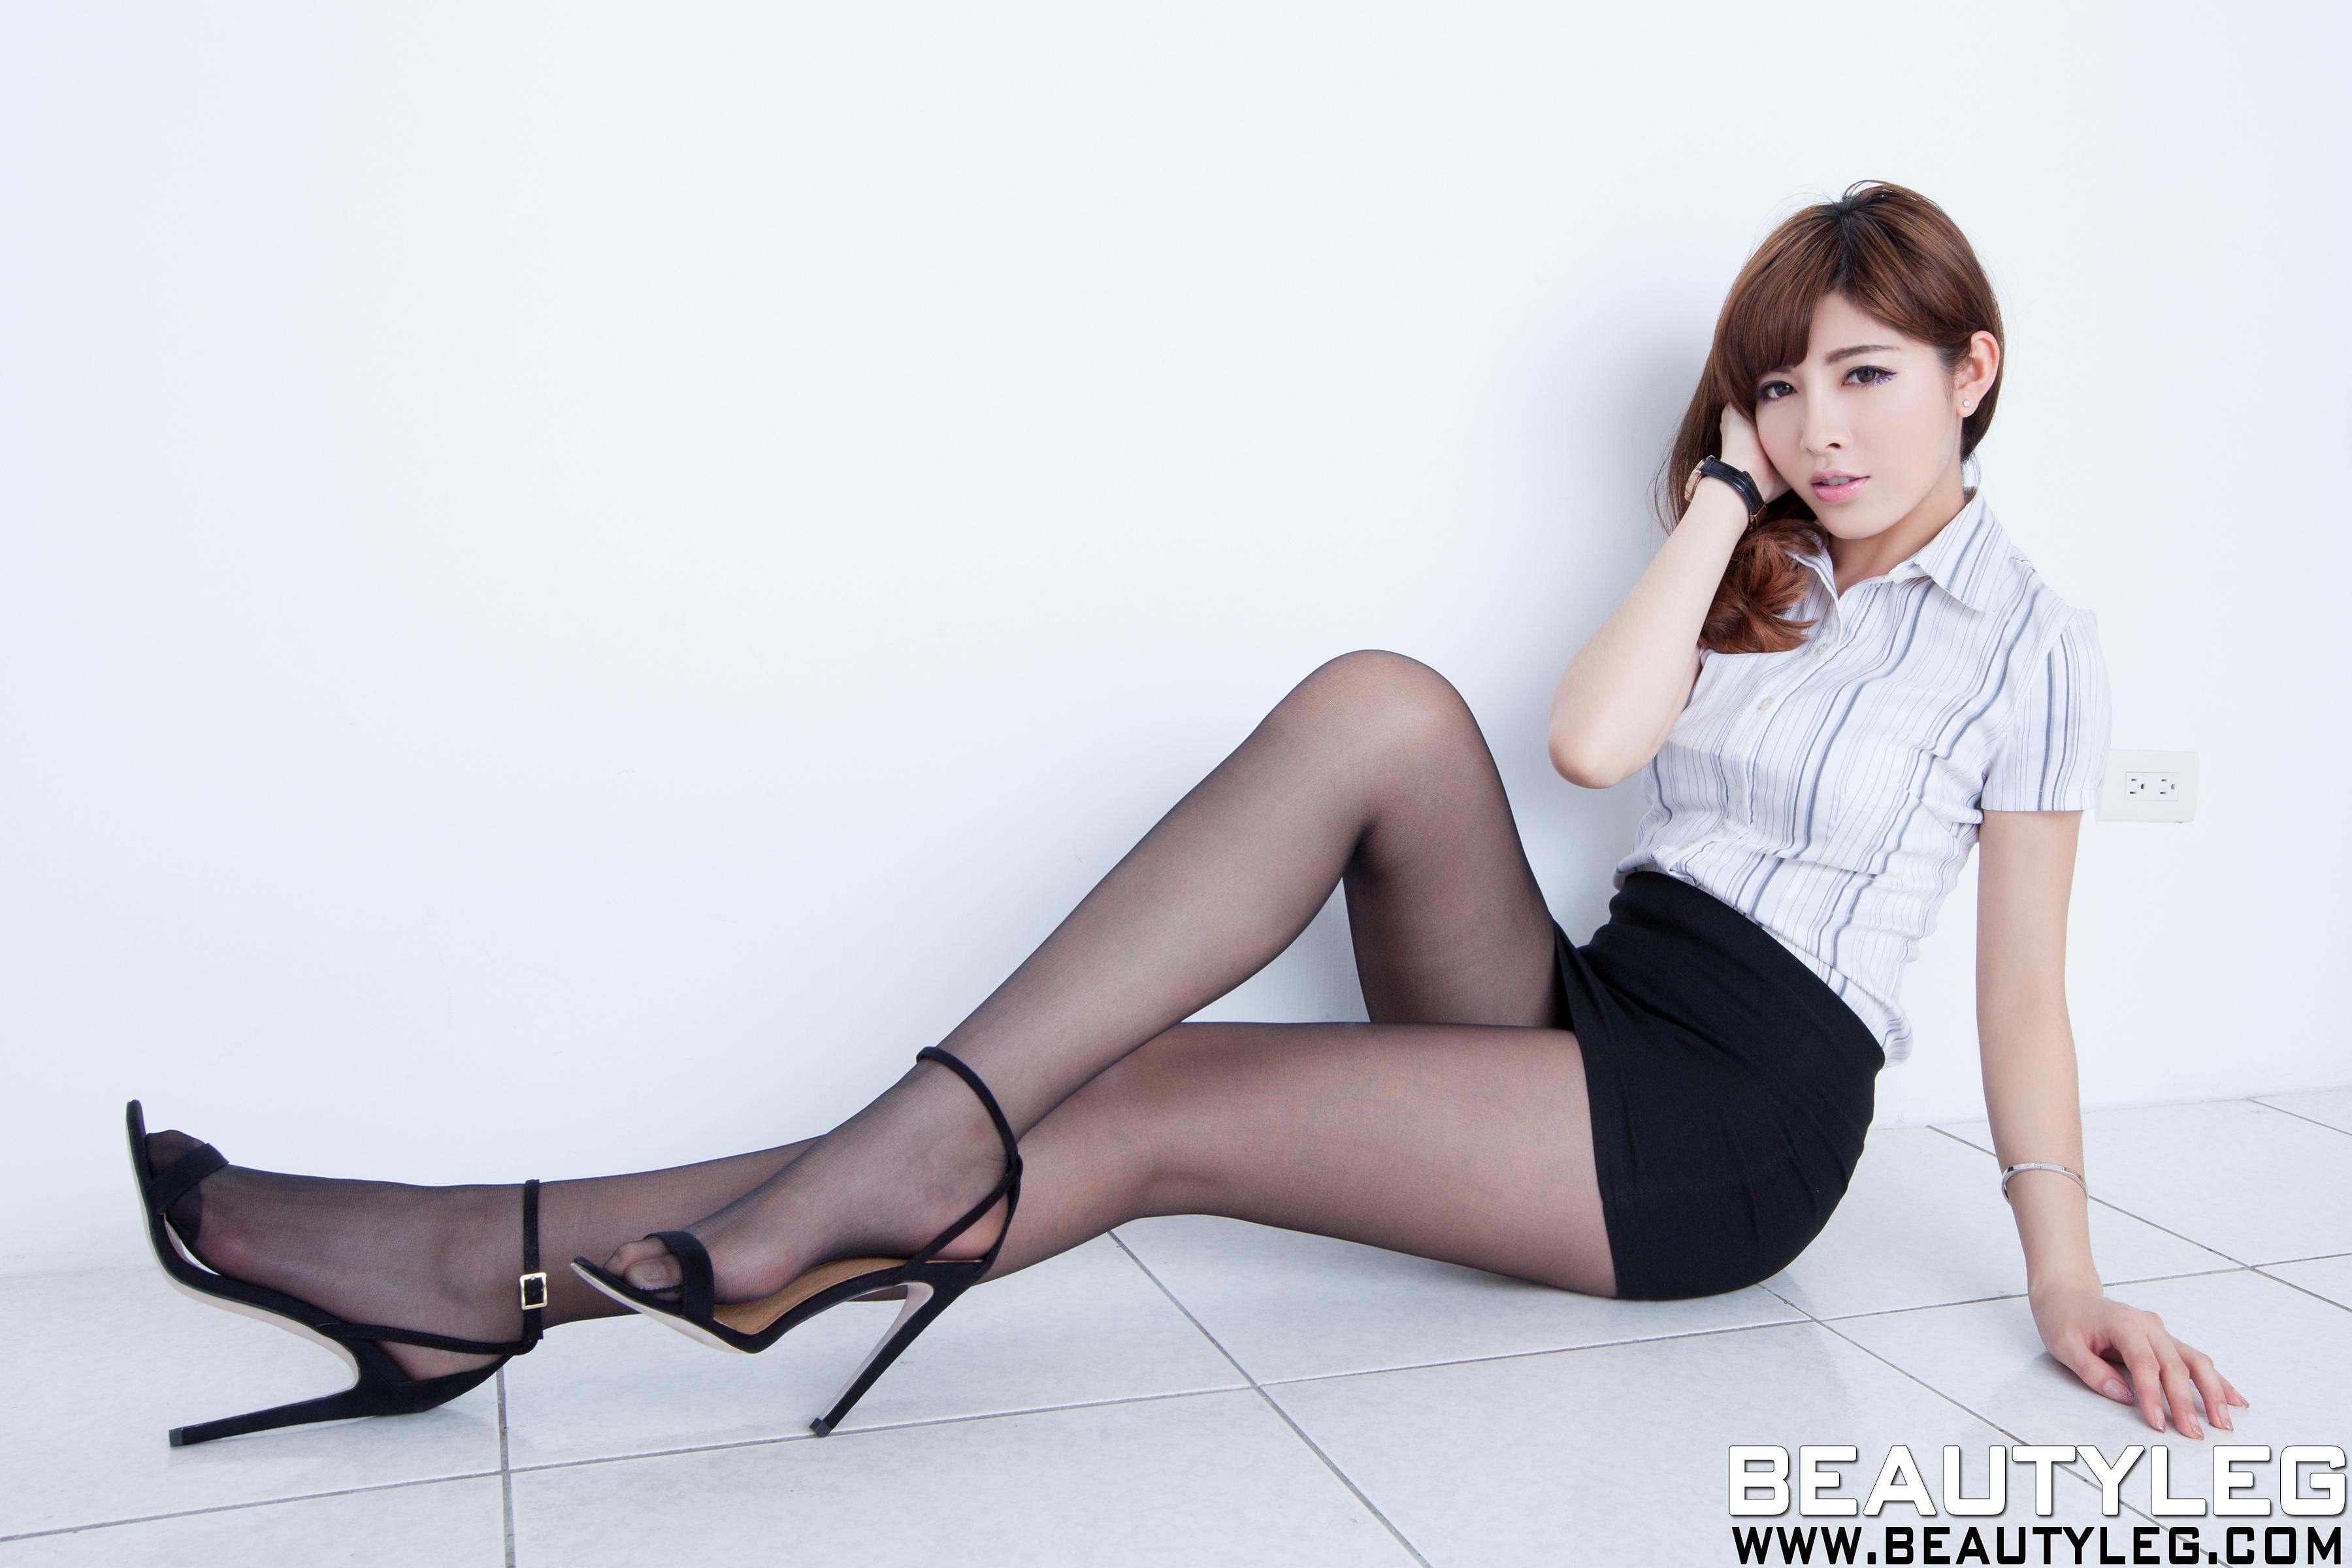 BEAUTYLEG 腿模 - Fre... Kate Beckinsale